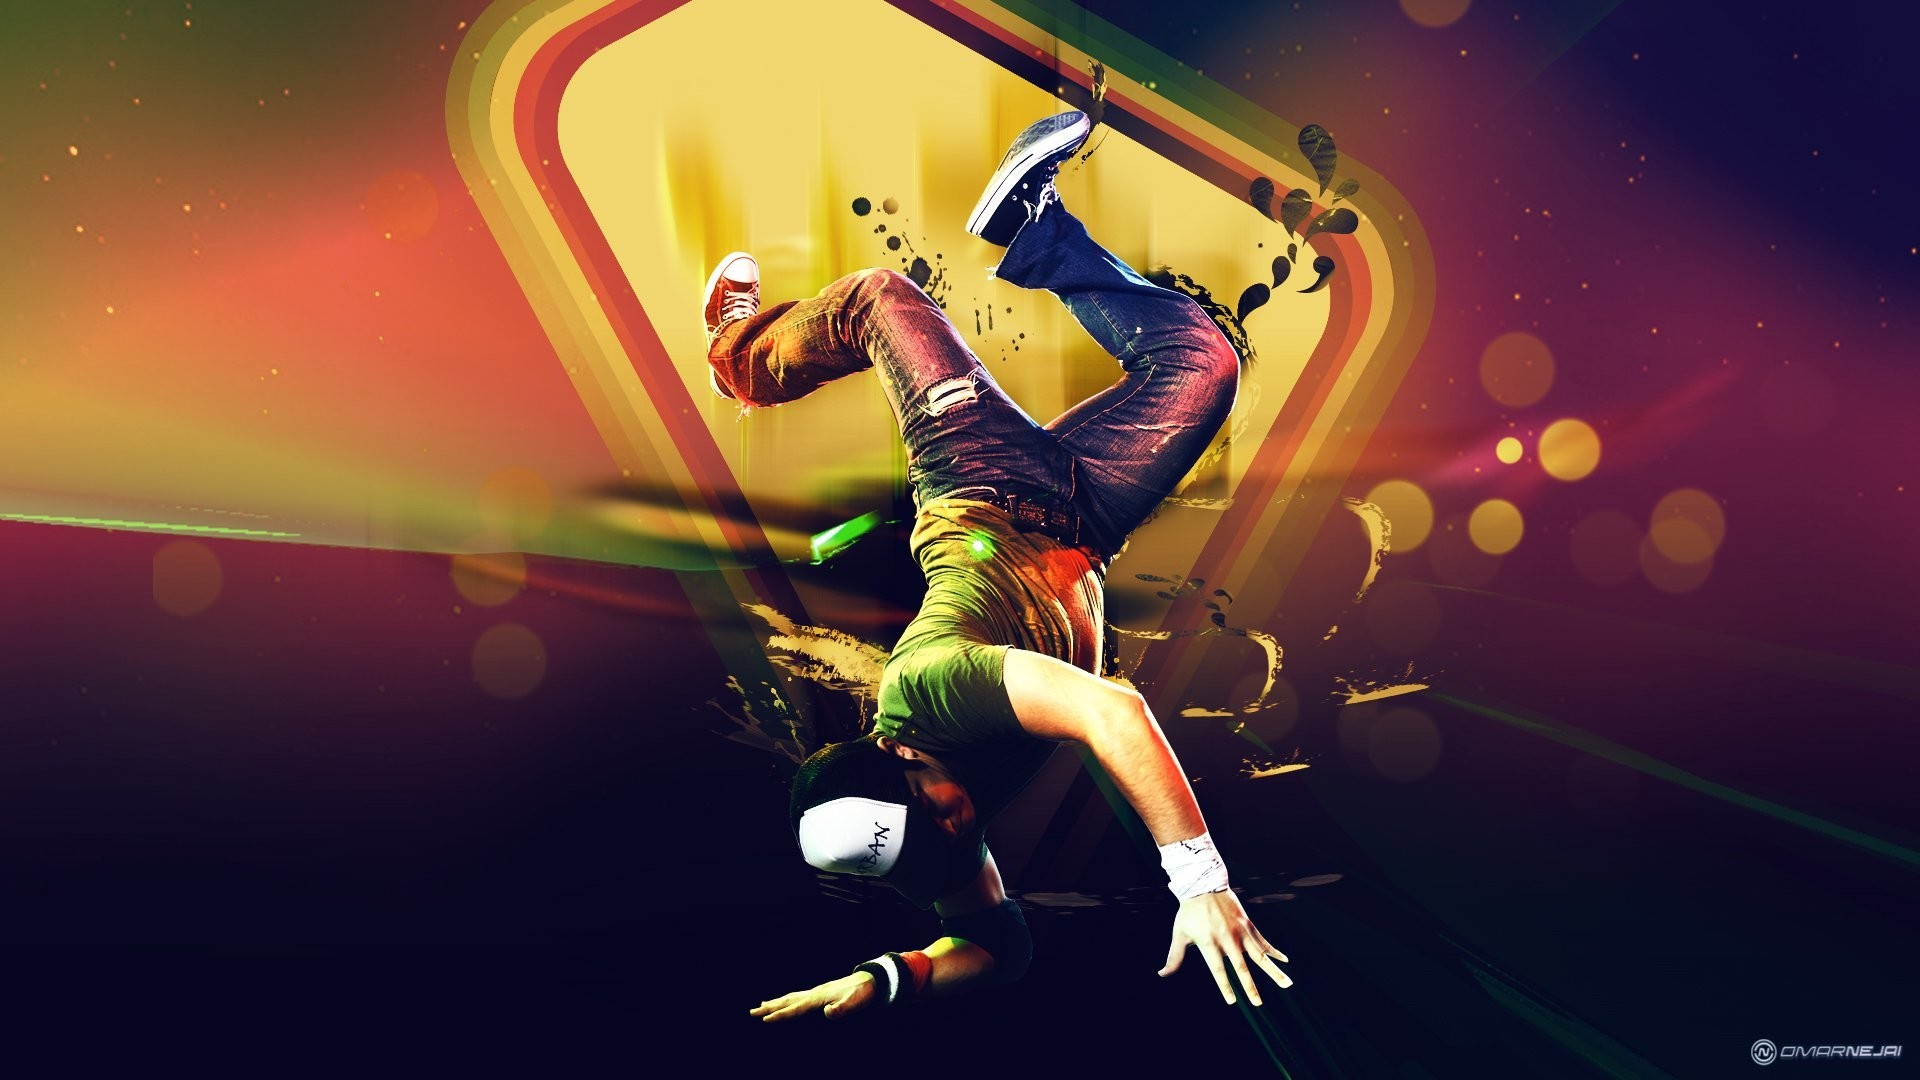 4k Orange Spiral Fire Light Dance Vj 2160p Background